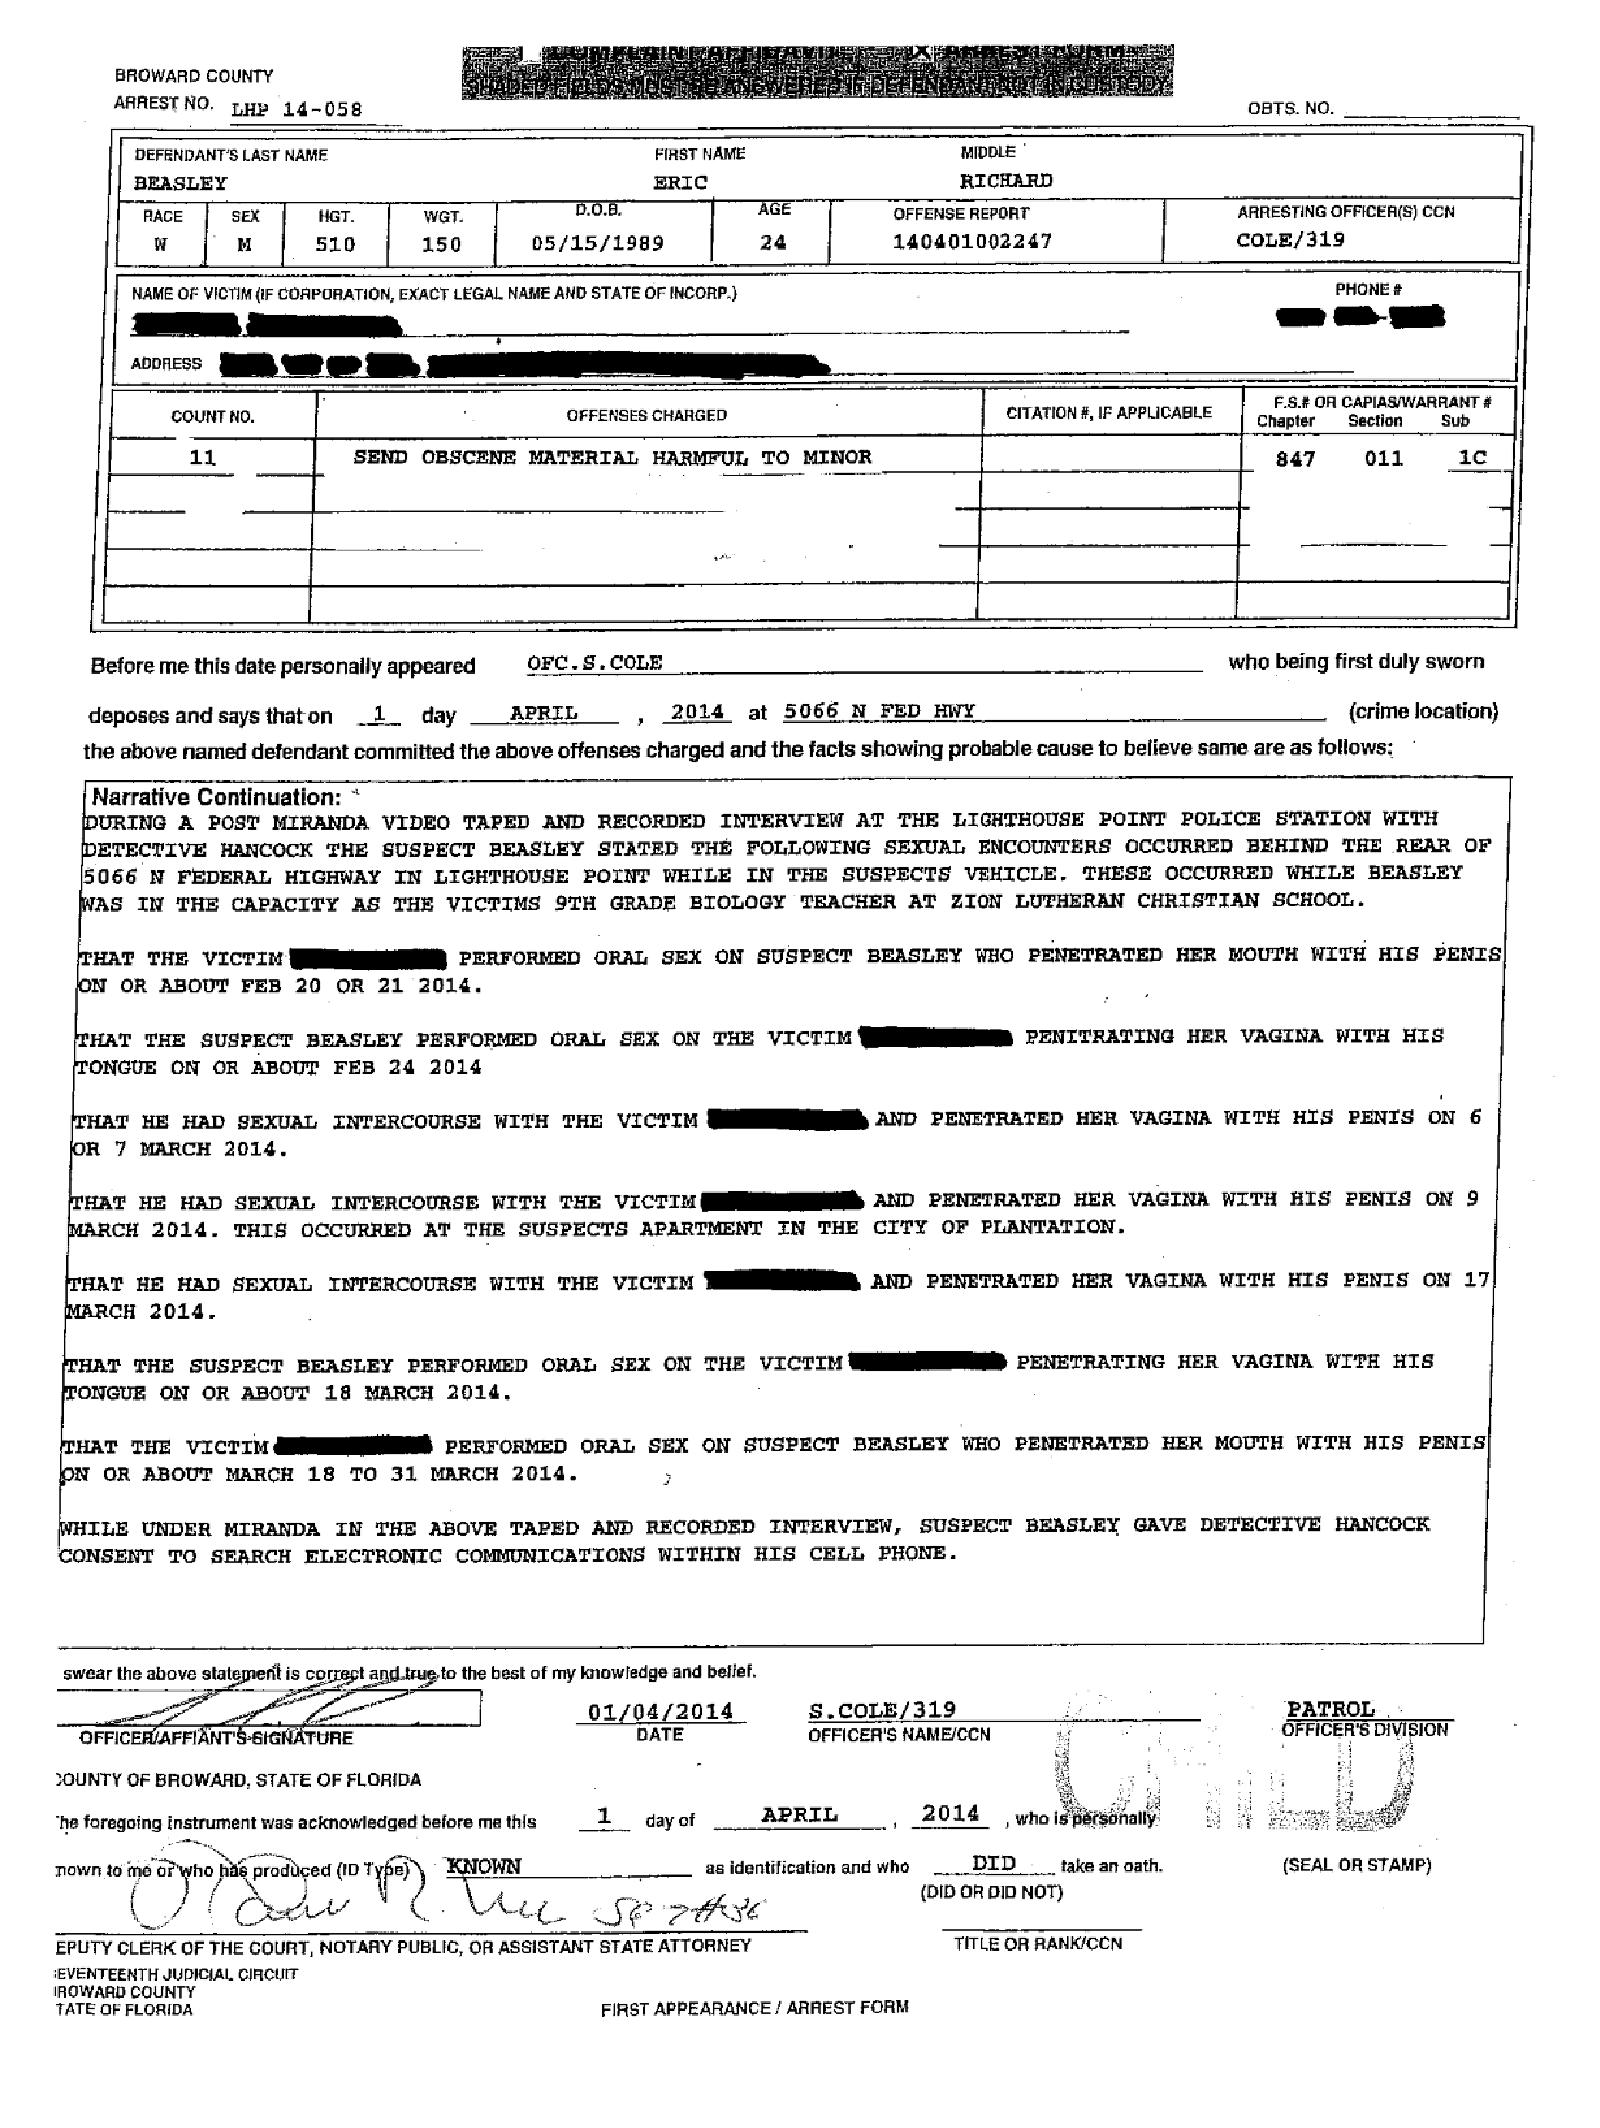 Copy of Beasley Eric arrest affidavit3.png